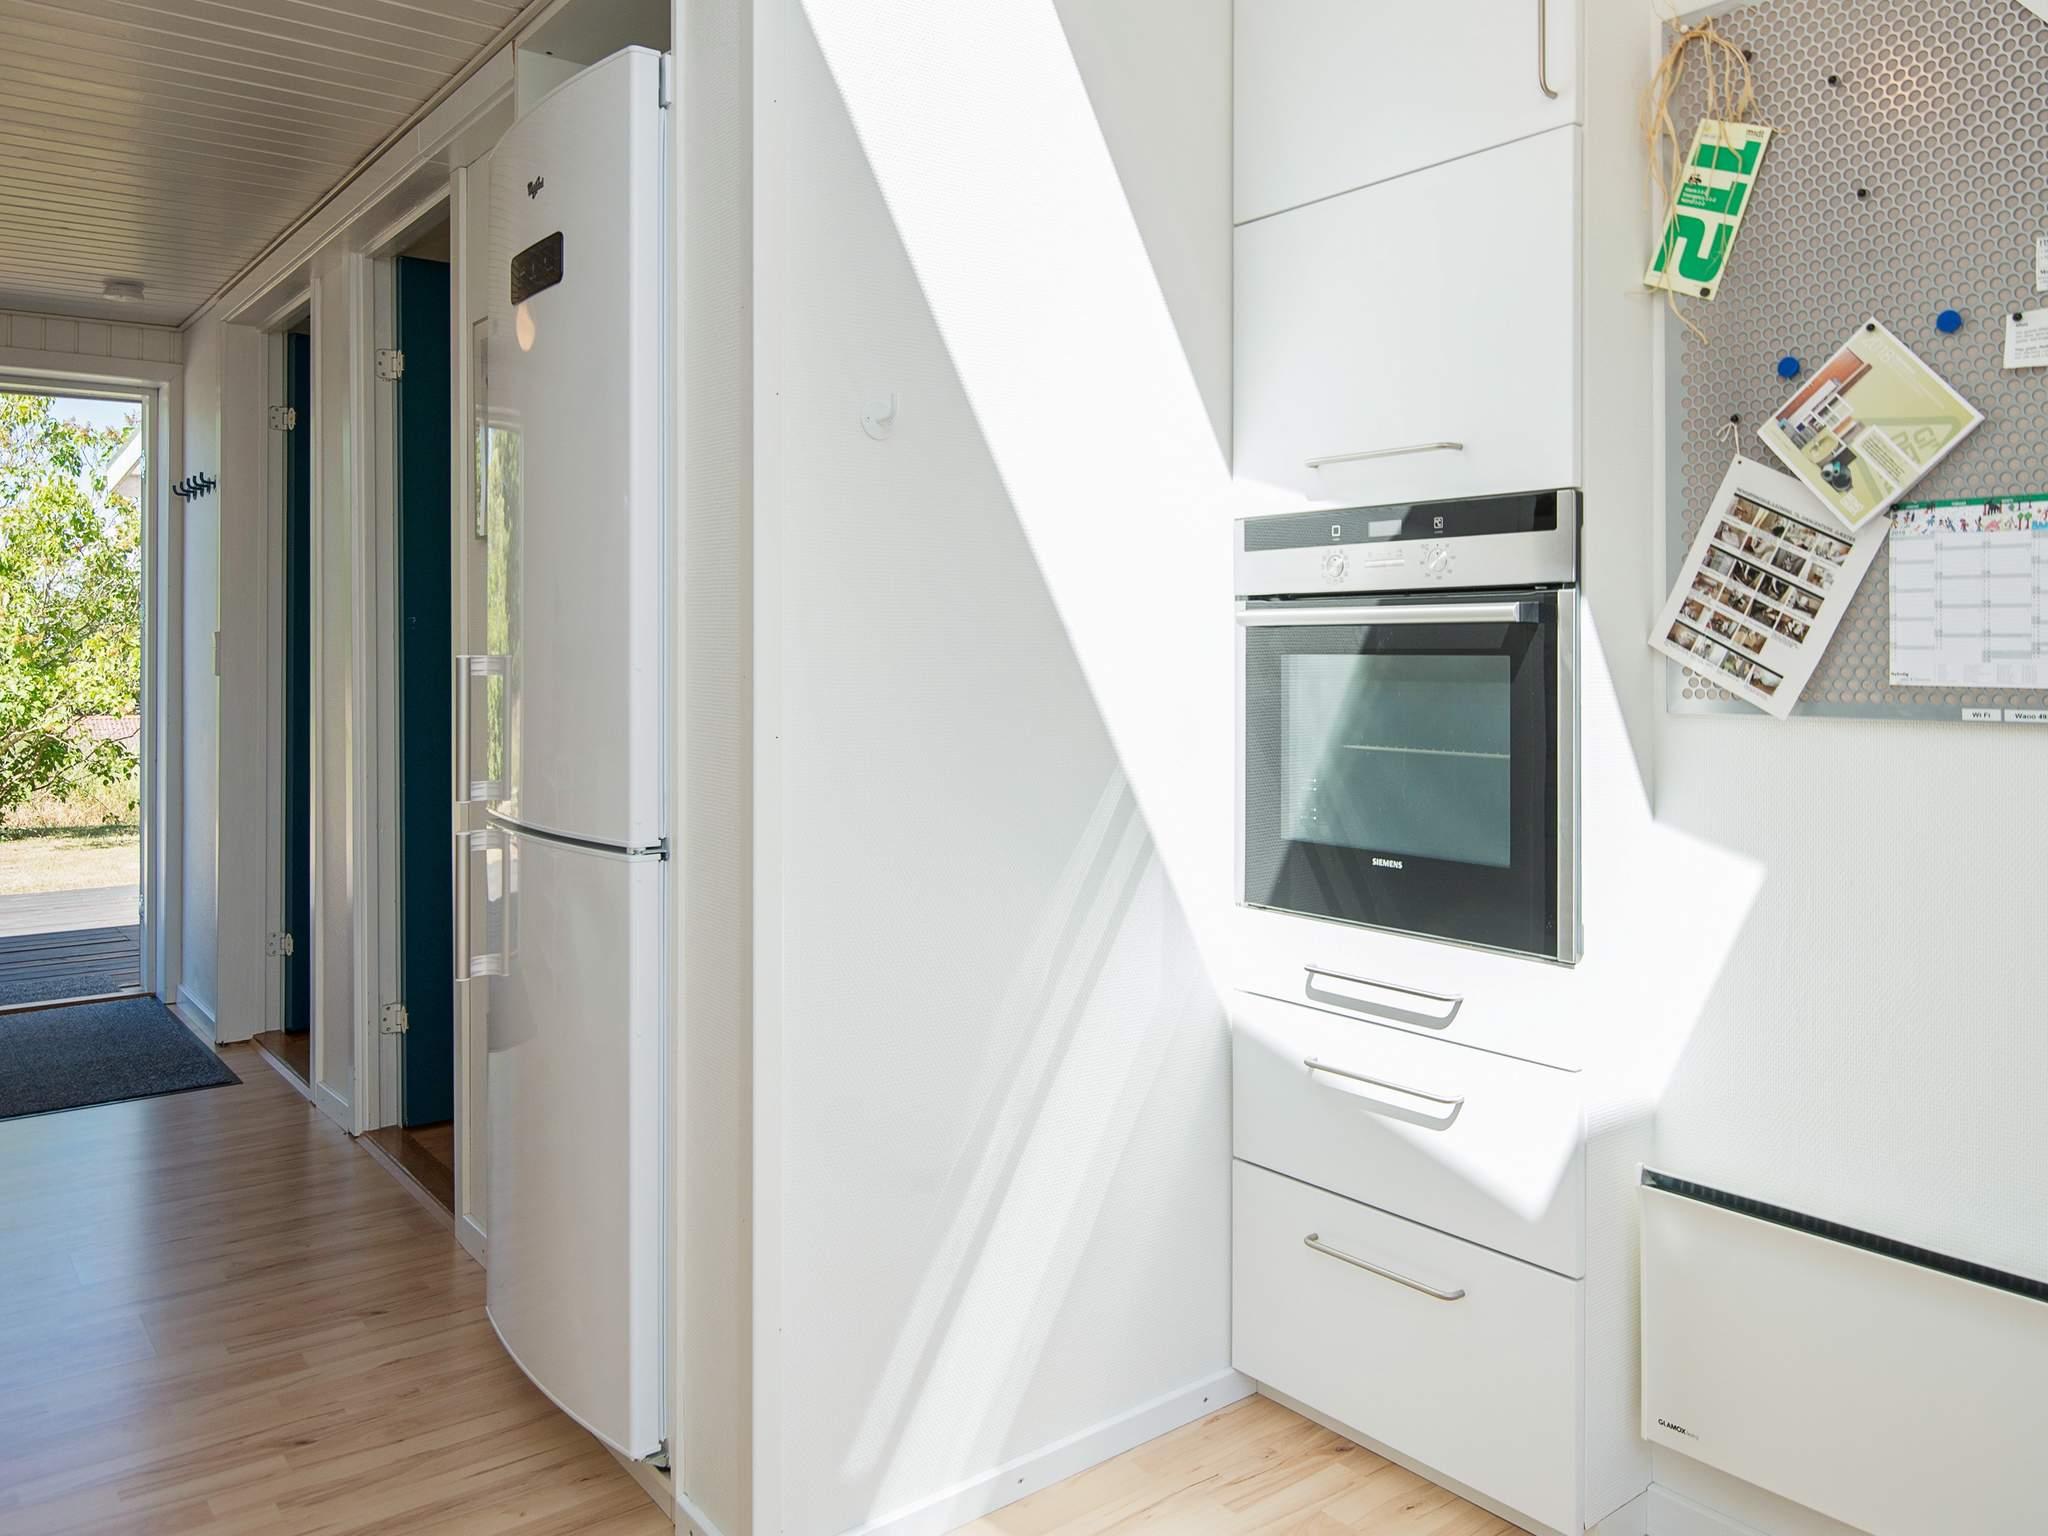 Maison de vacances Helgenæs (978615), Knebel, , Jutland Est, Danemark, image 6